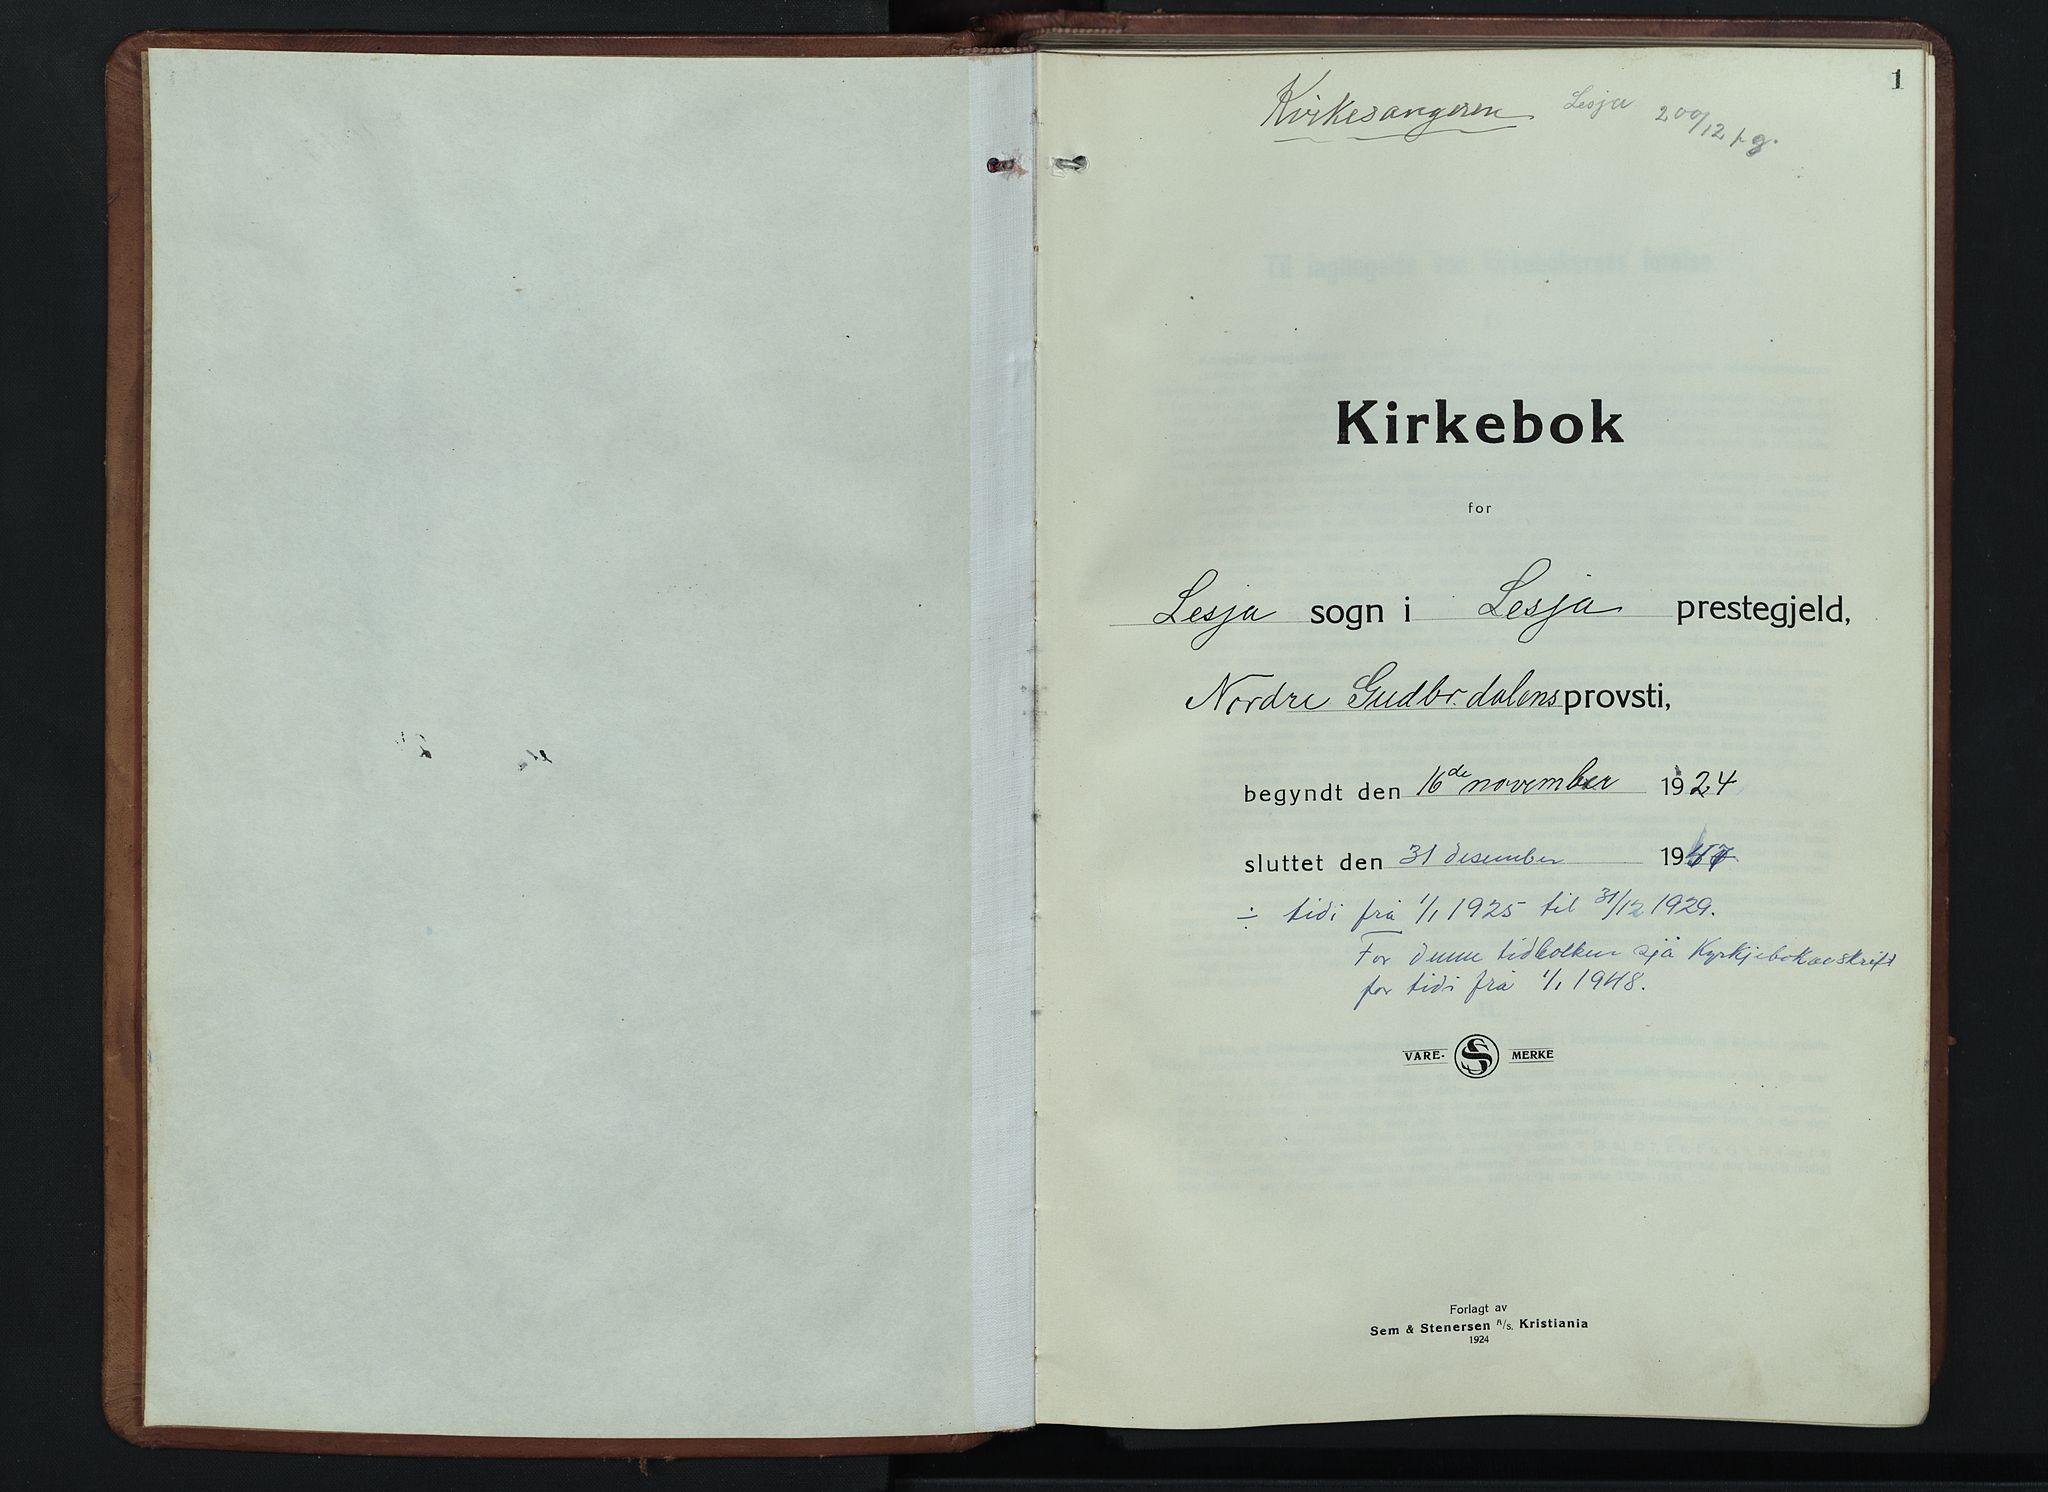 SAH, Lesja prestekontor, Klokkerbok nr. 9, 1924-1947, s. 1